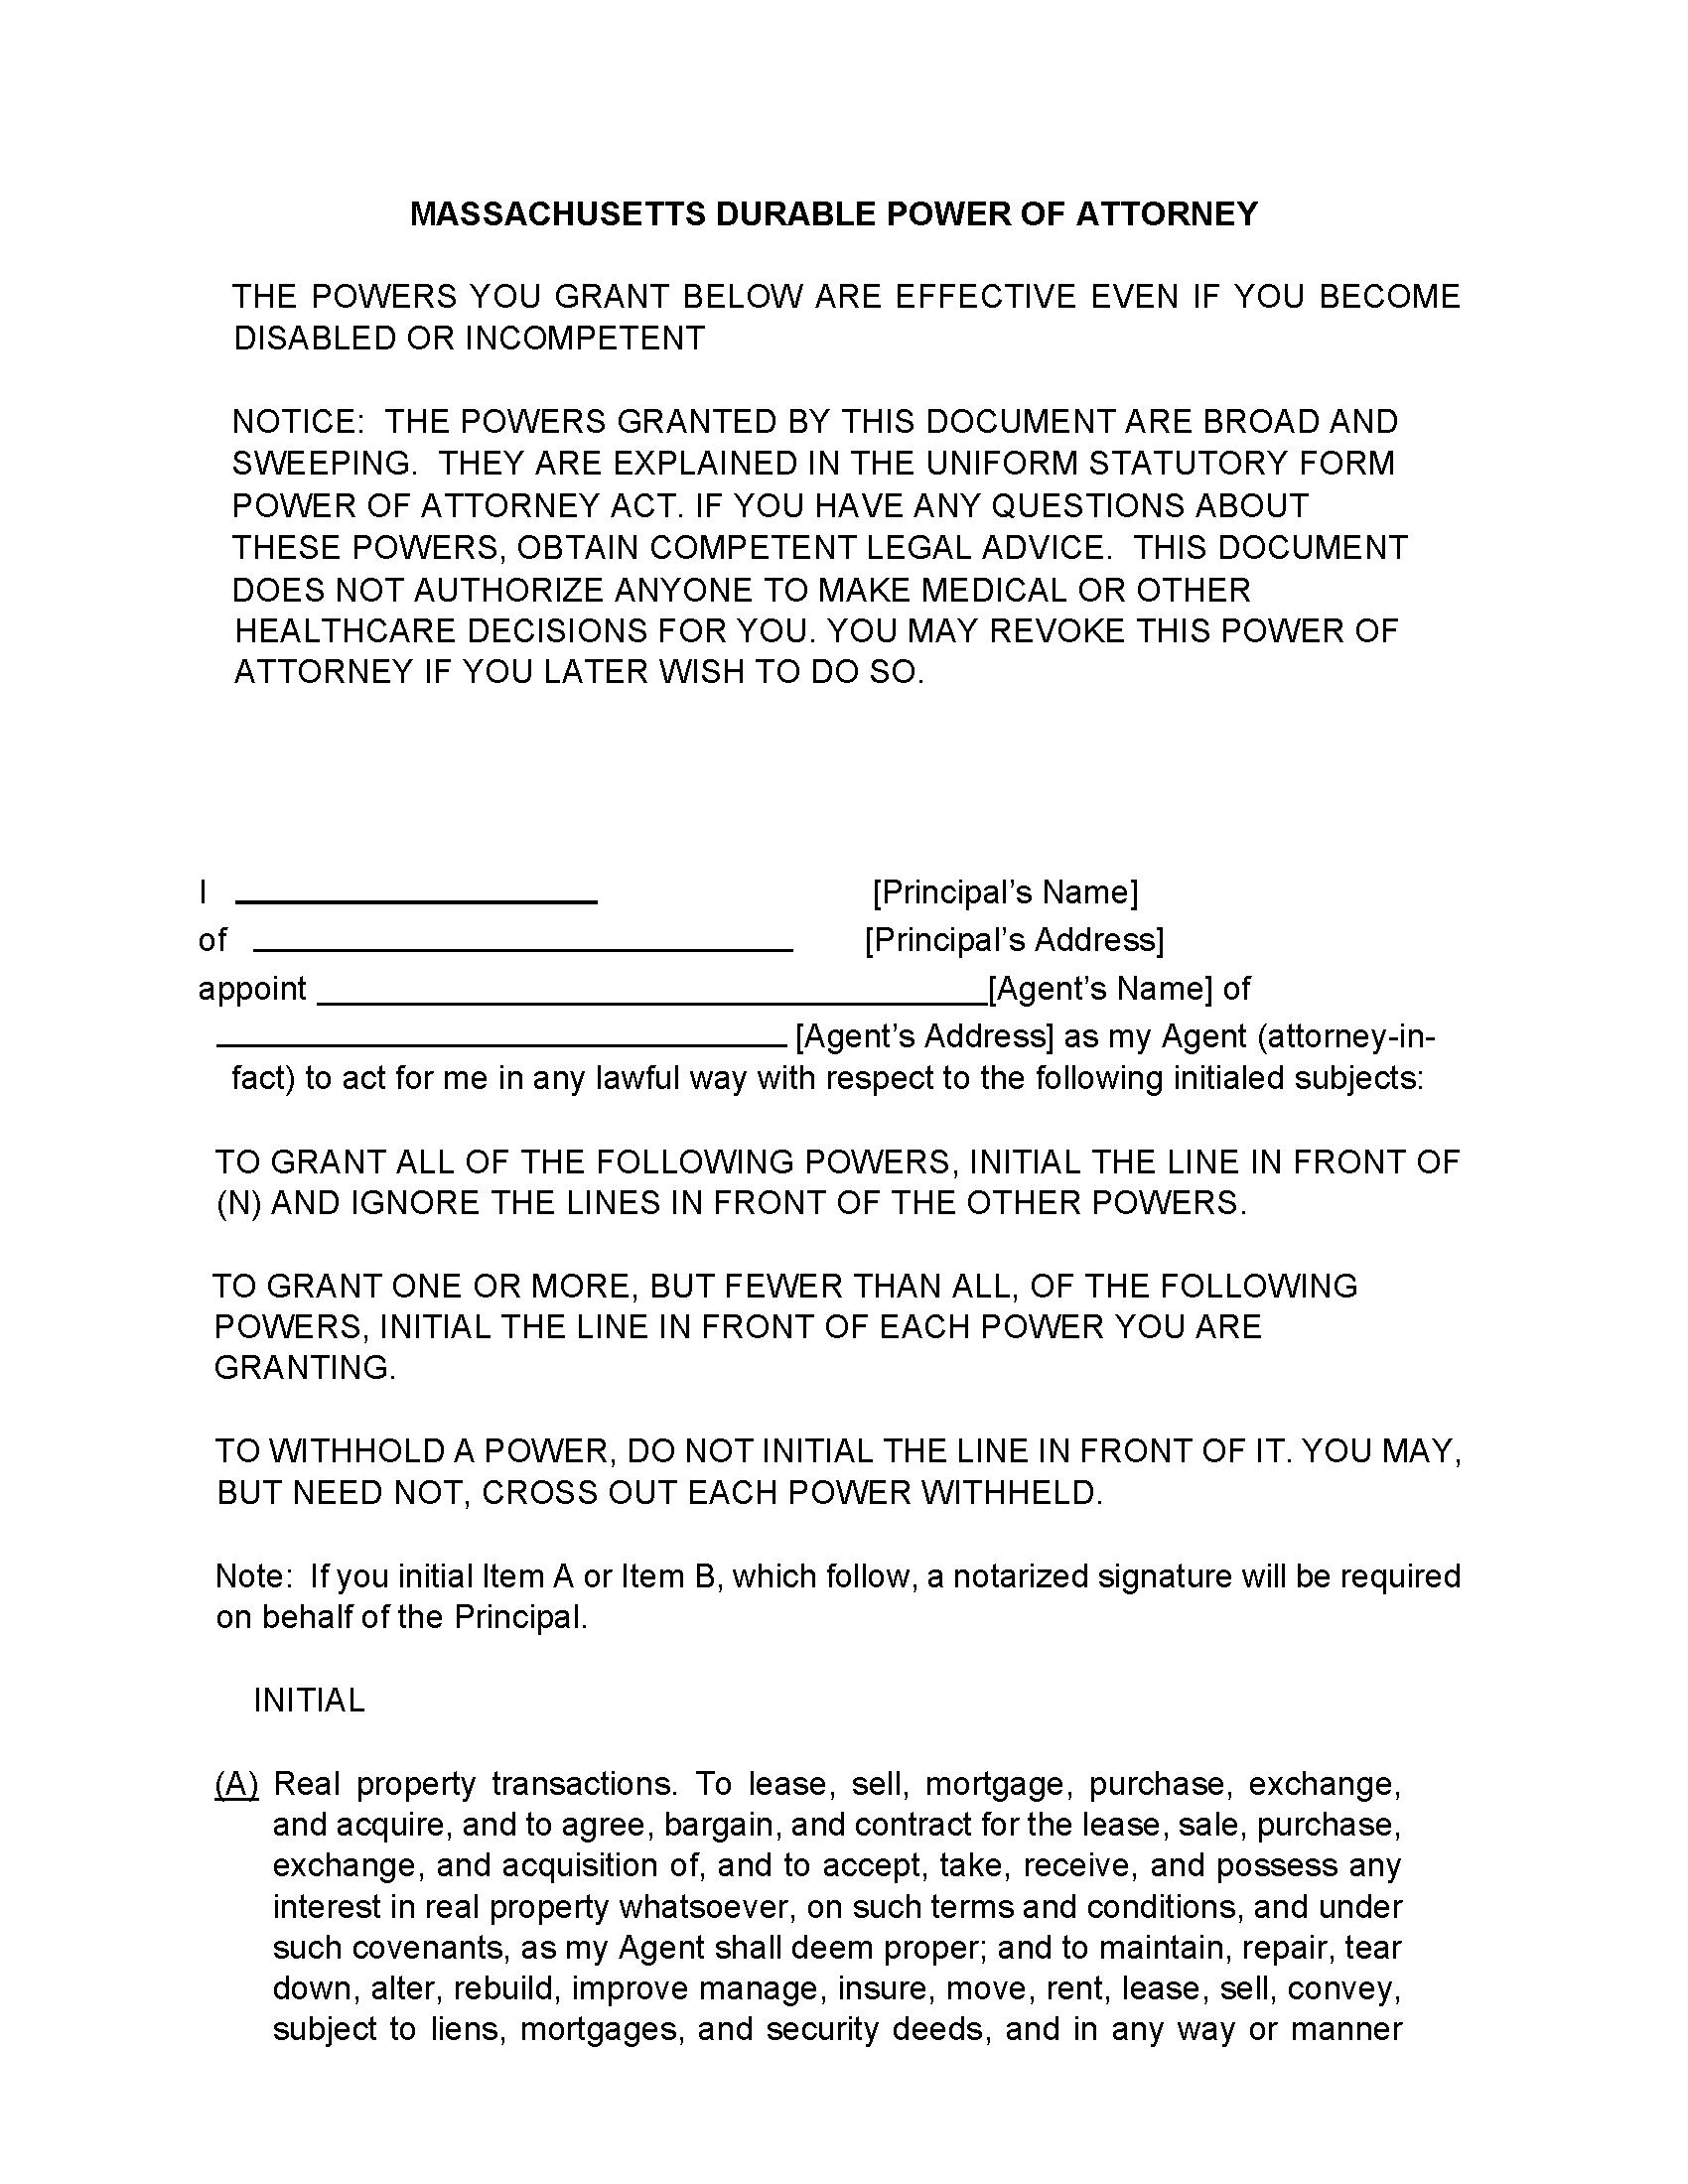 Massachusetts Financial Power of Attorney Form